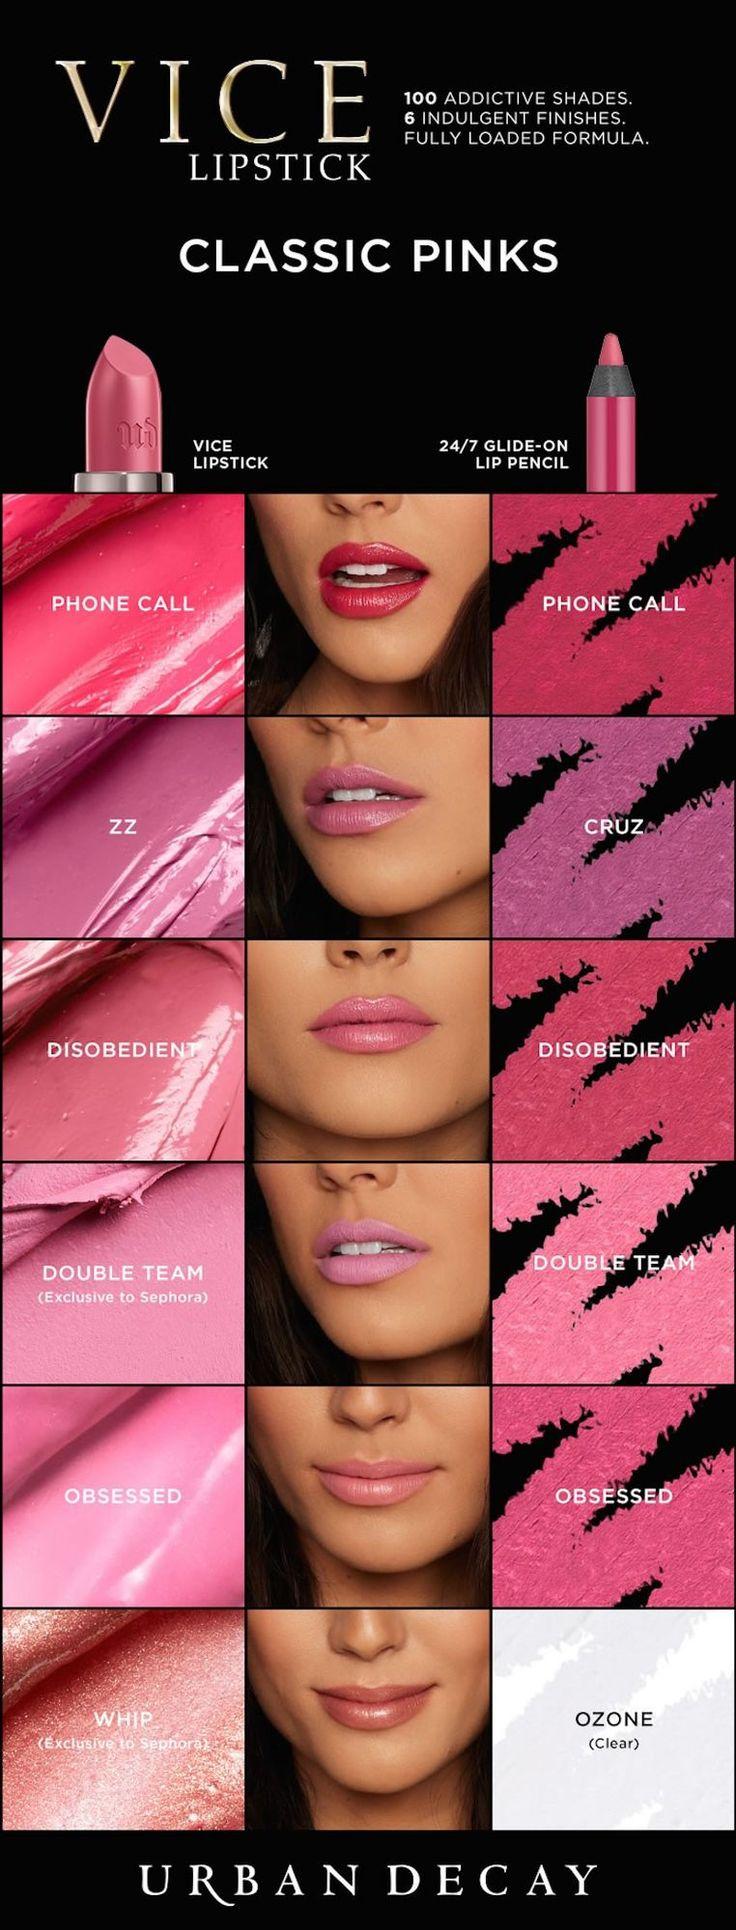 Vice Lipstick: Browns                                                                                                                                                                                 More